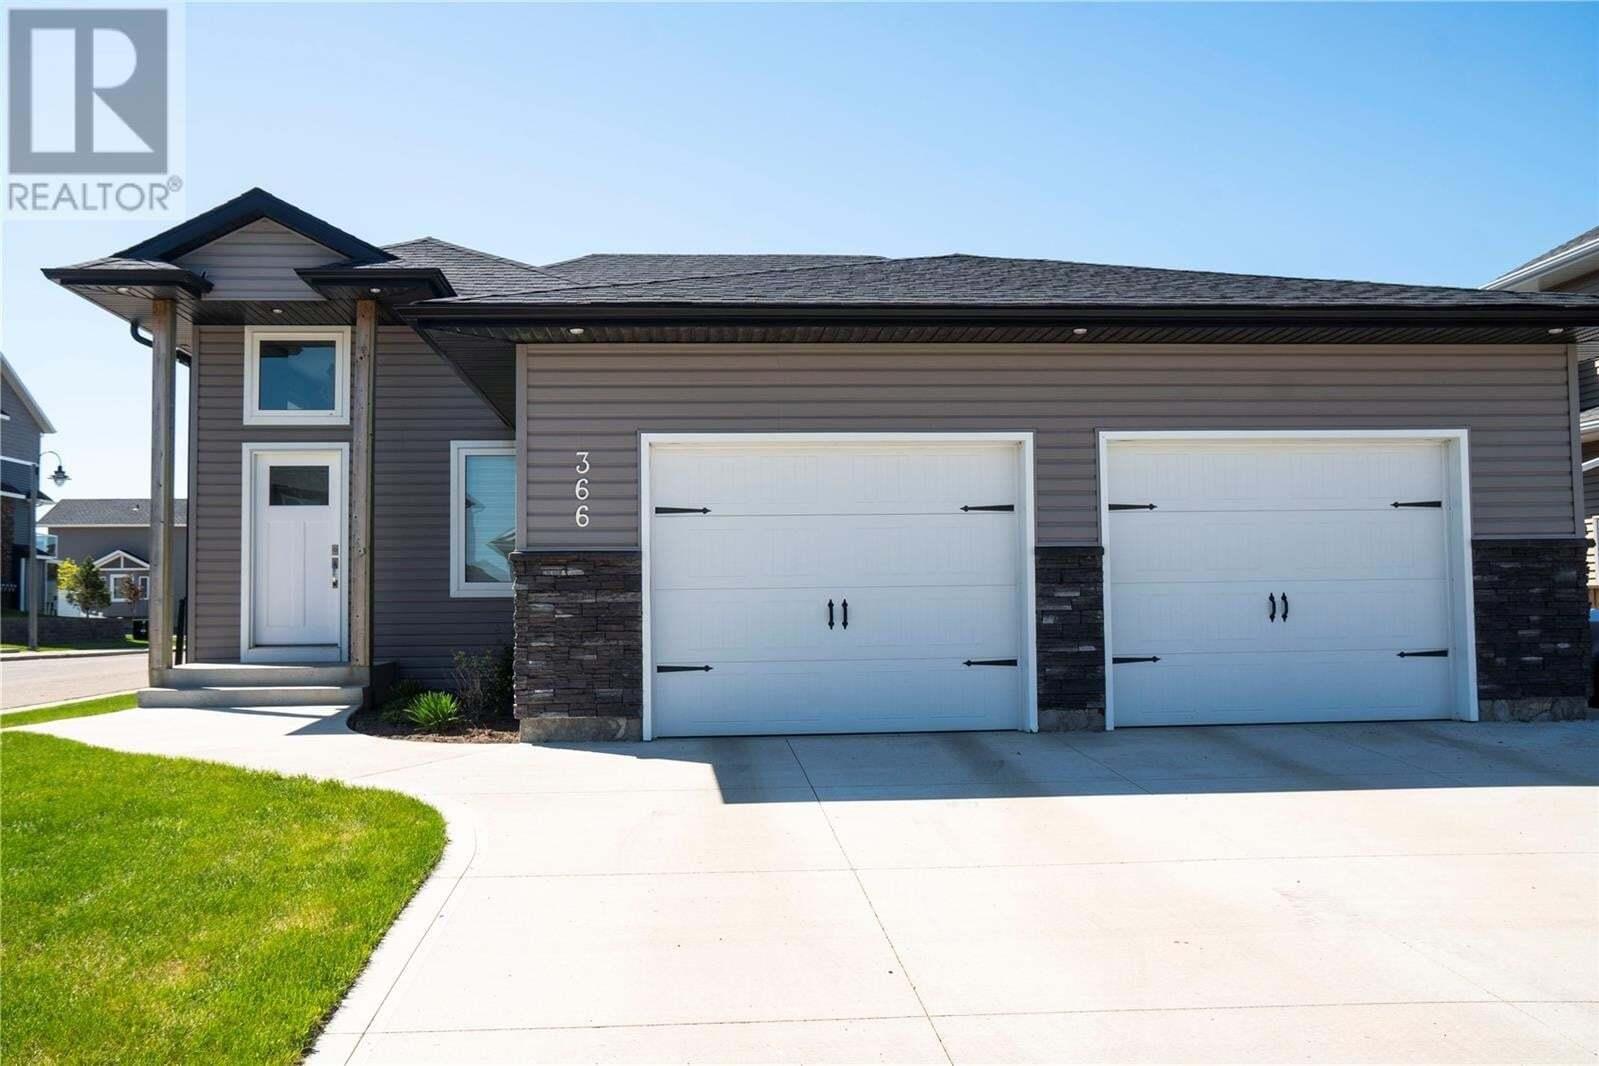 House for sale at 366 Pringle Ct Saskatoon Saskatchewan - MLS: SK809580